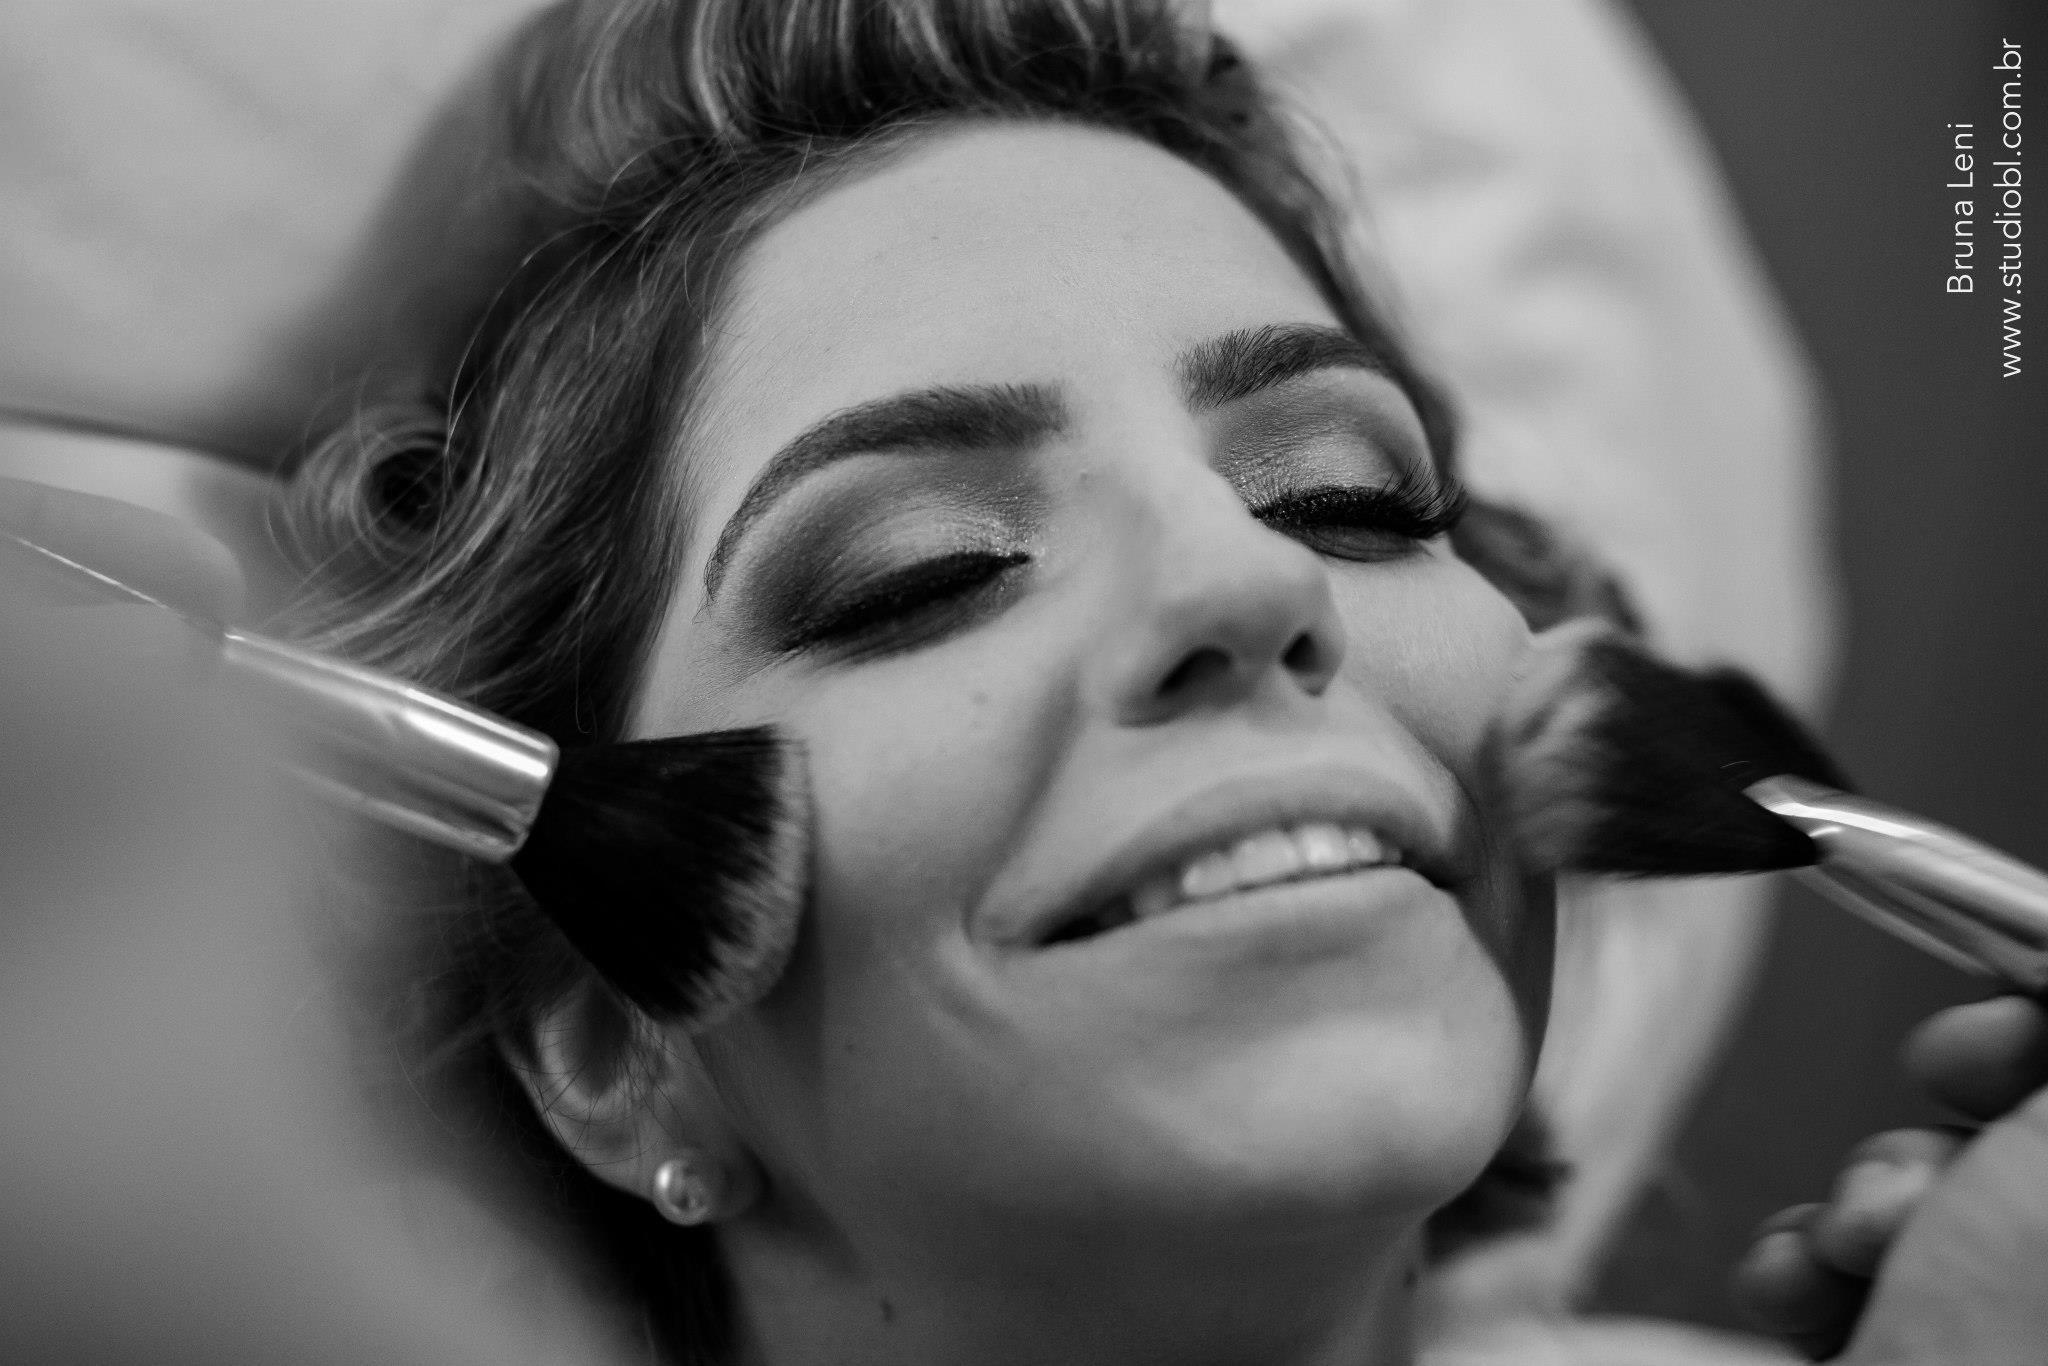 FOTO MARAVILHOSA LINDA DA NOIVA DANIELLE DE MORAES maquiador(a)